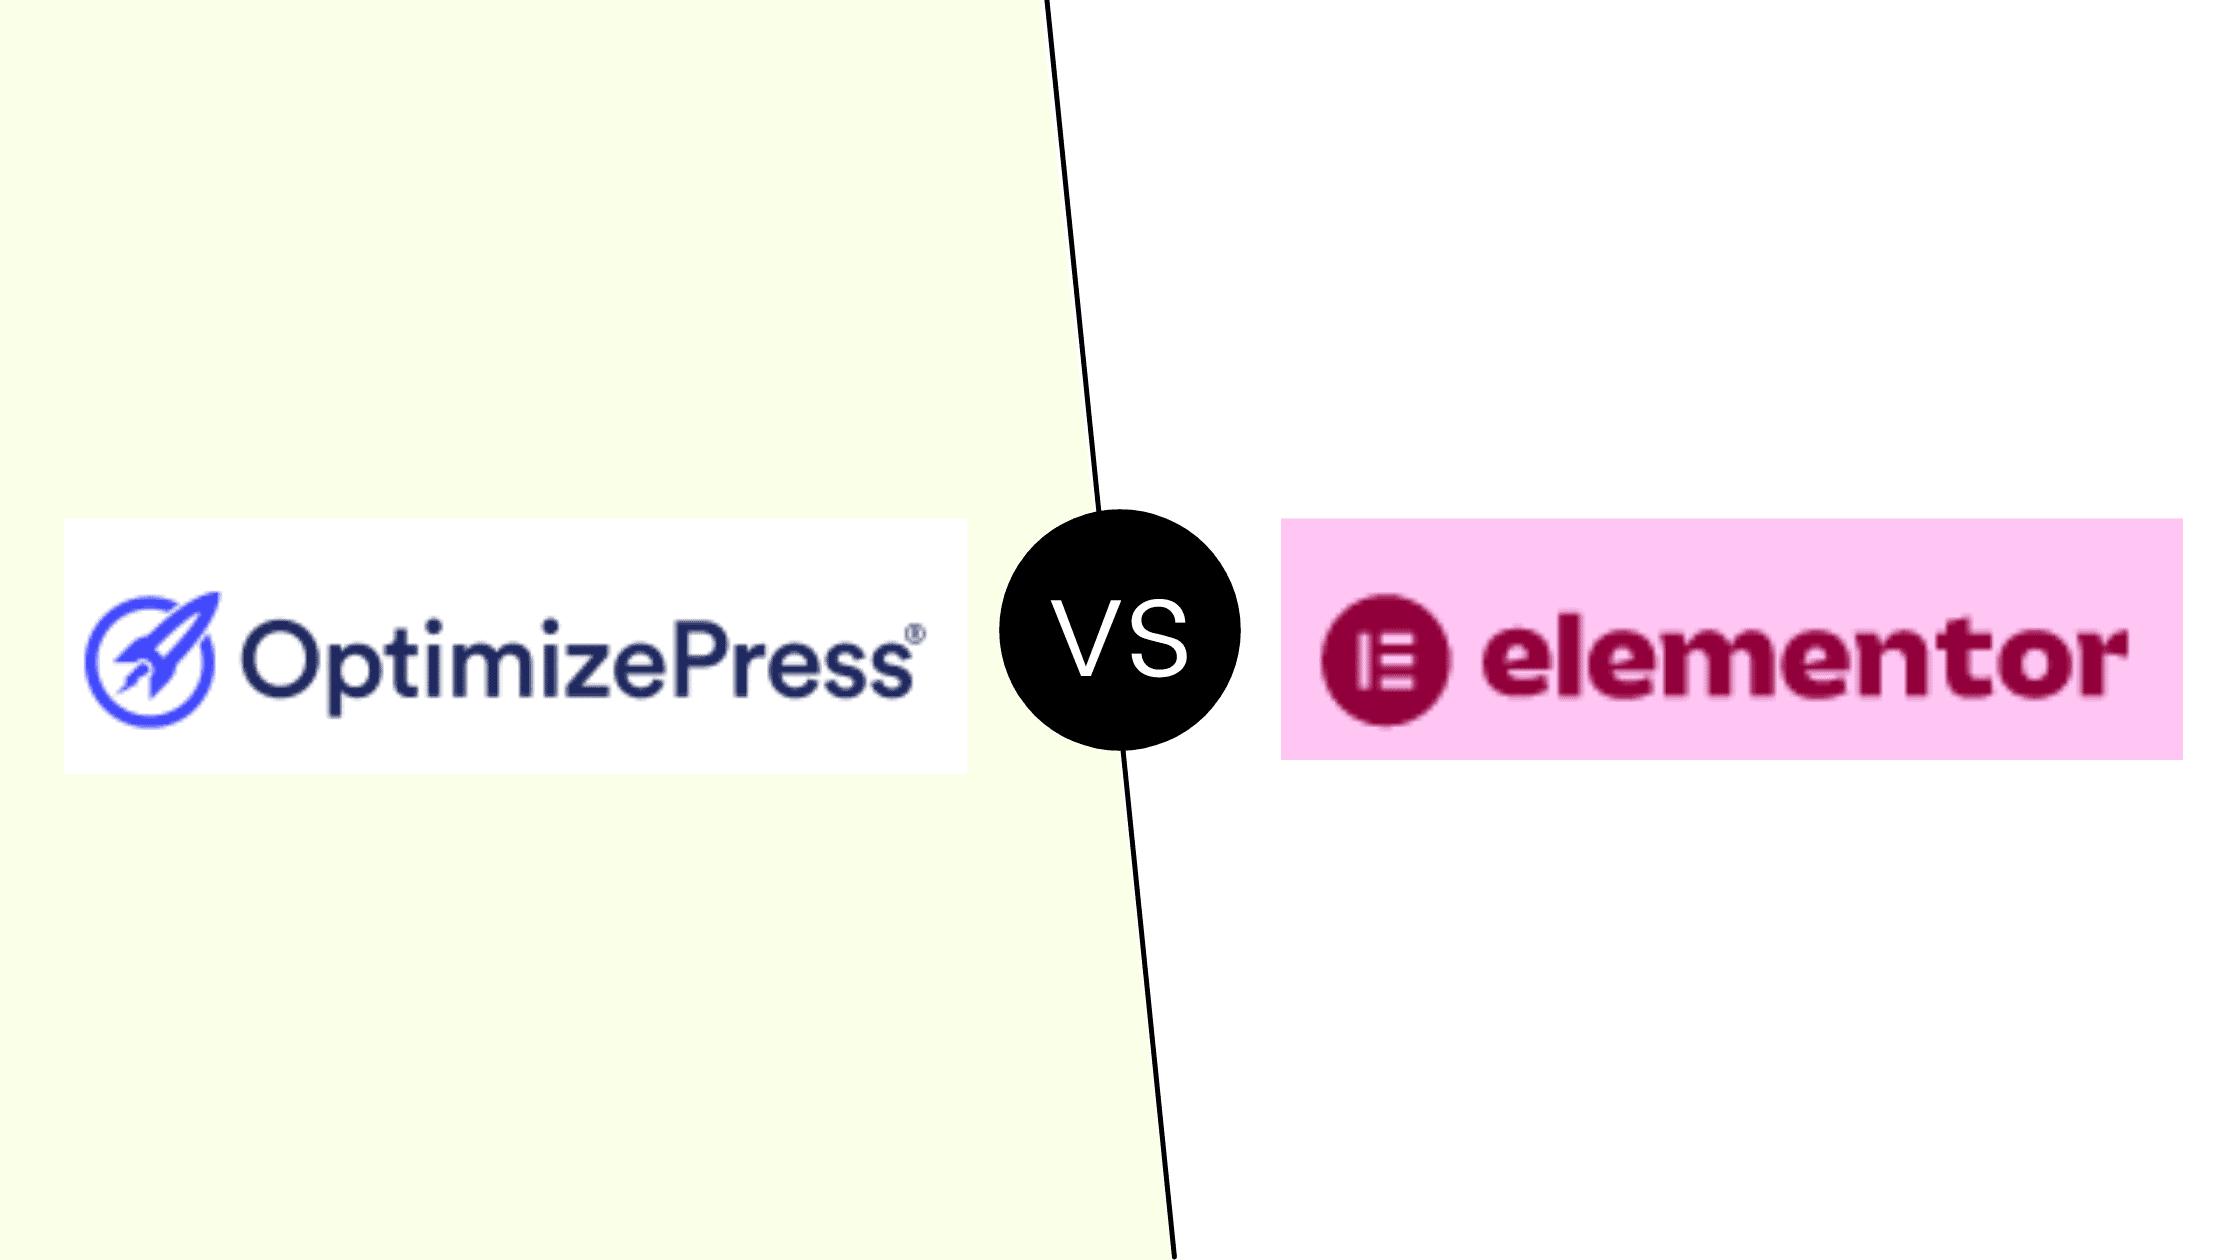 Optimizepress vs Elementor